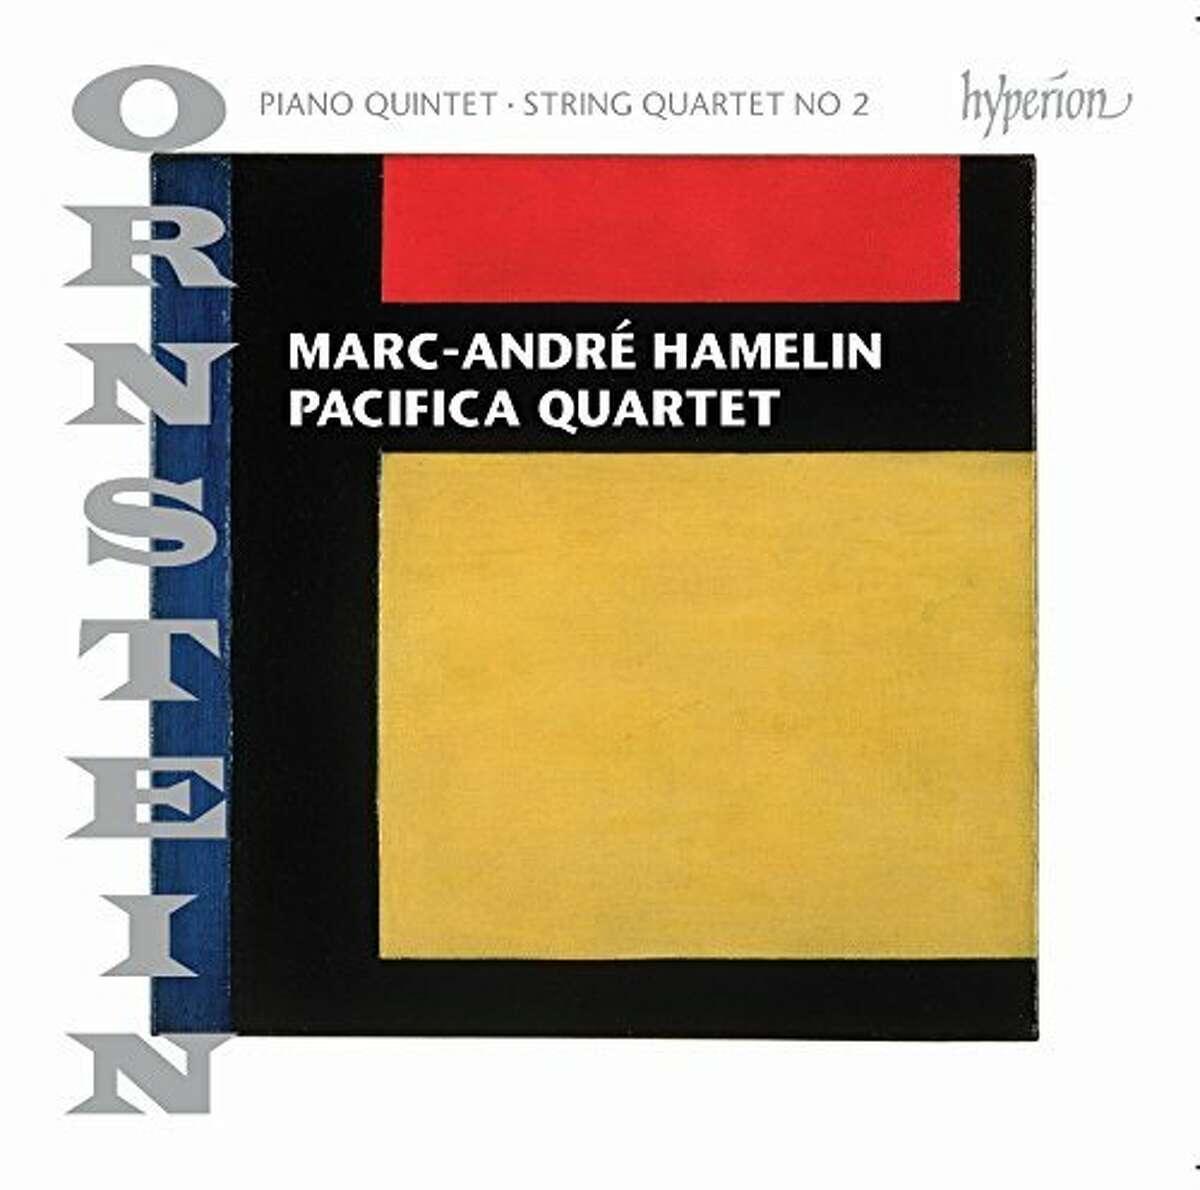 CD cover: Ornstein, Piano Quintet & String Quartet No. 2